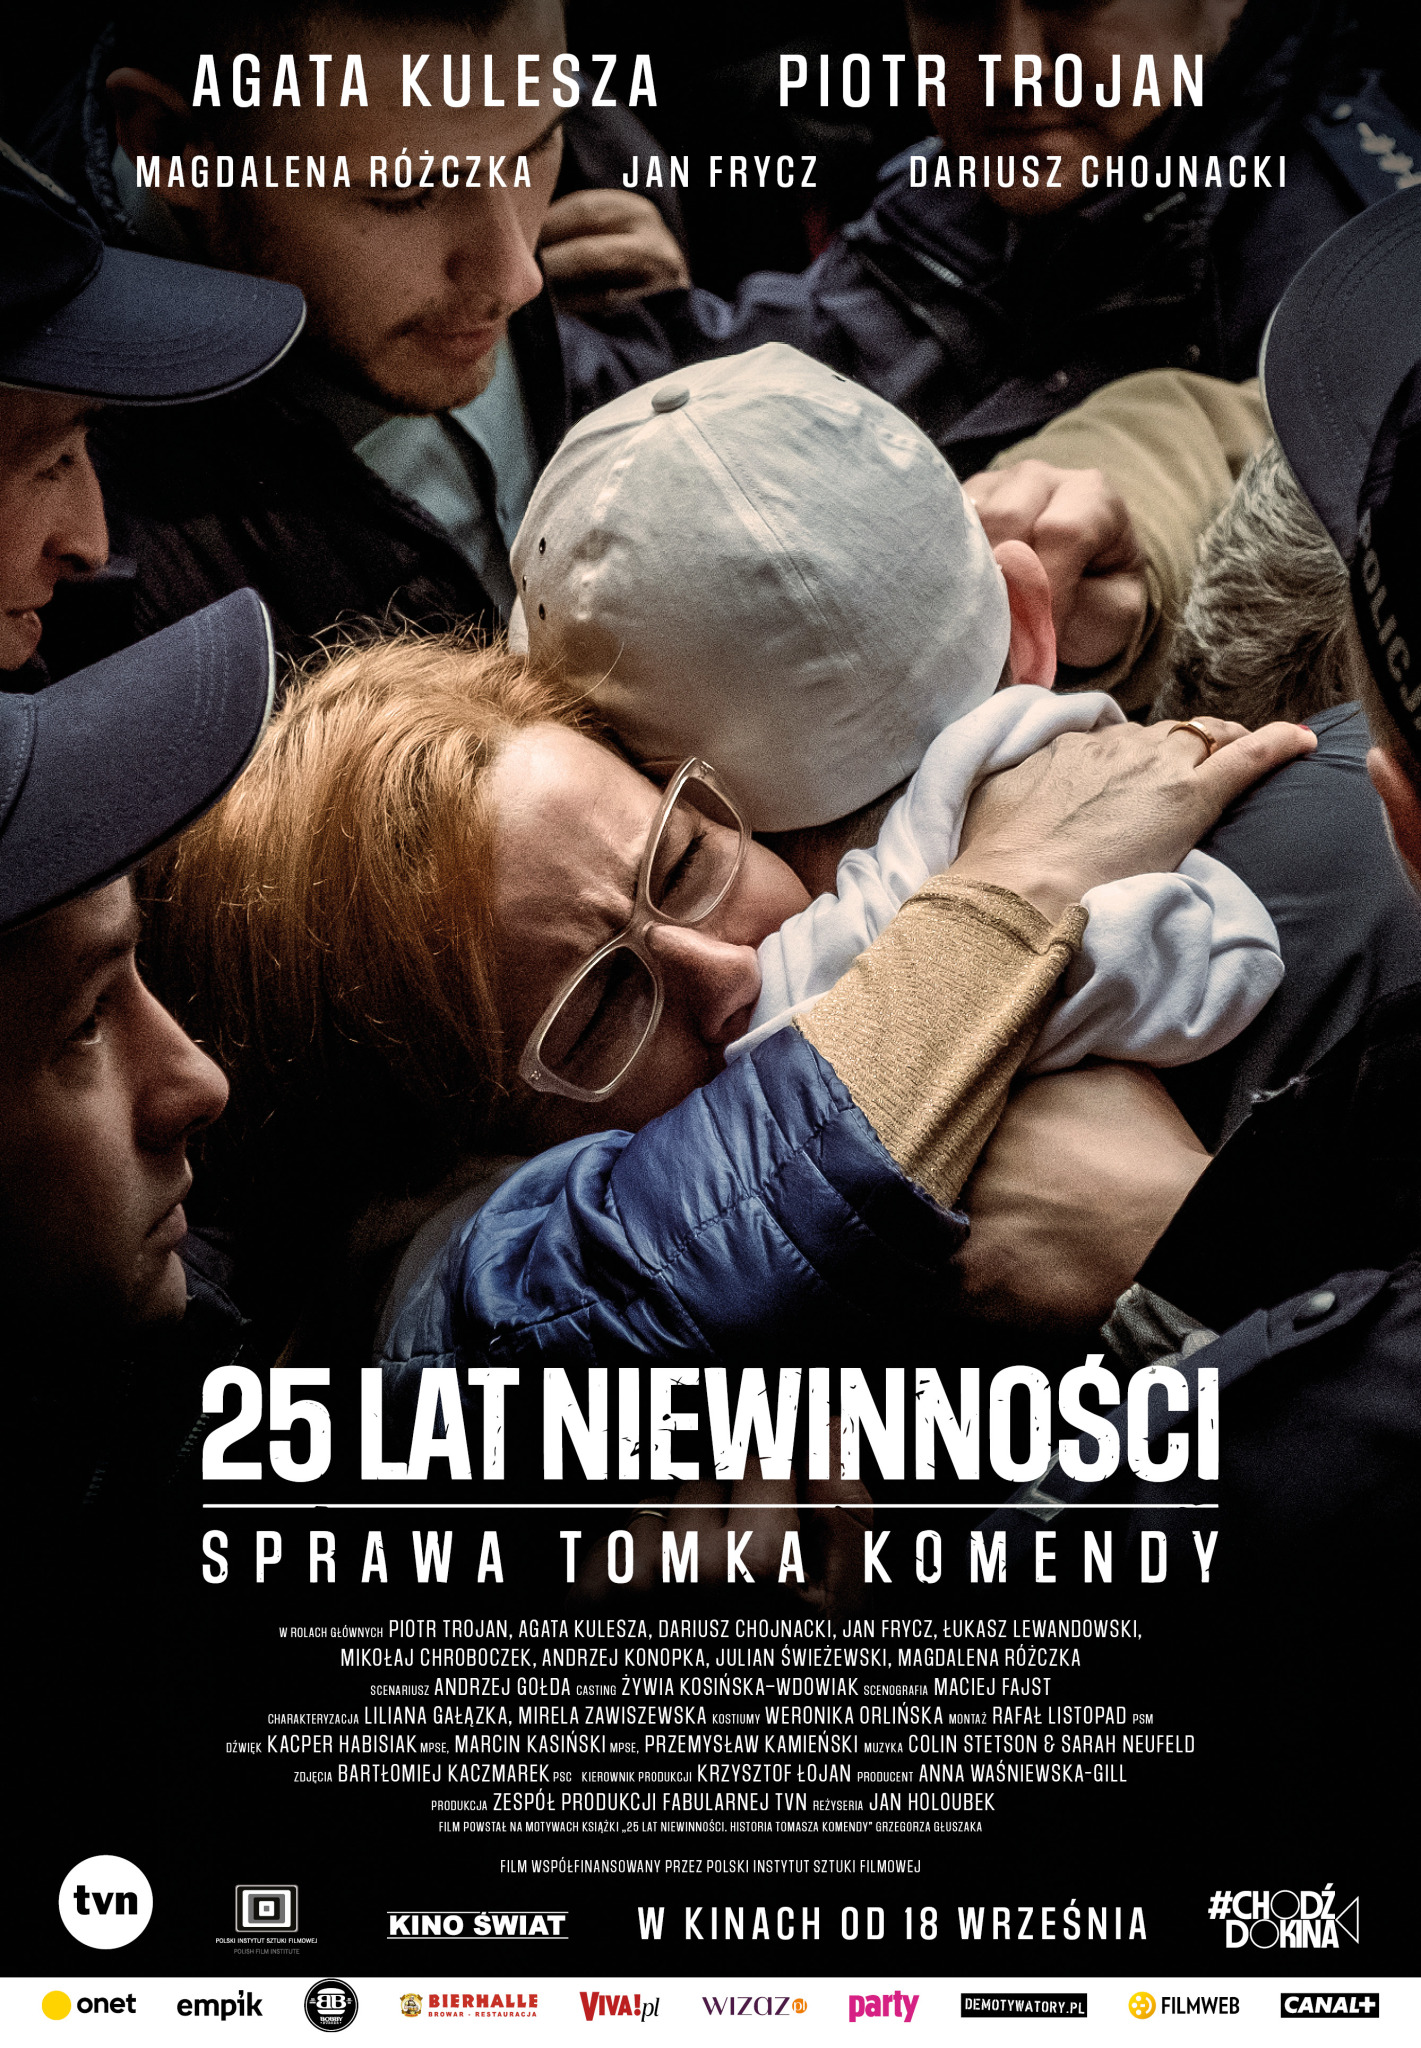 25 lat niewinności. Sprawa Tomka Komendy (2020) PL